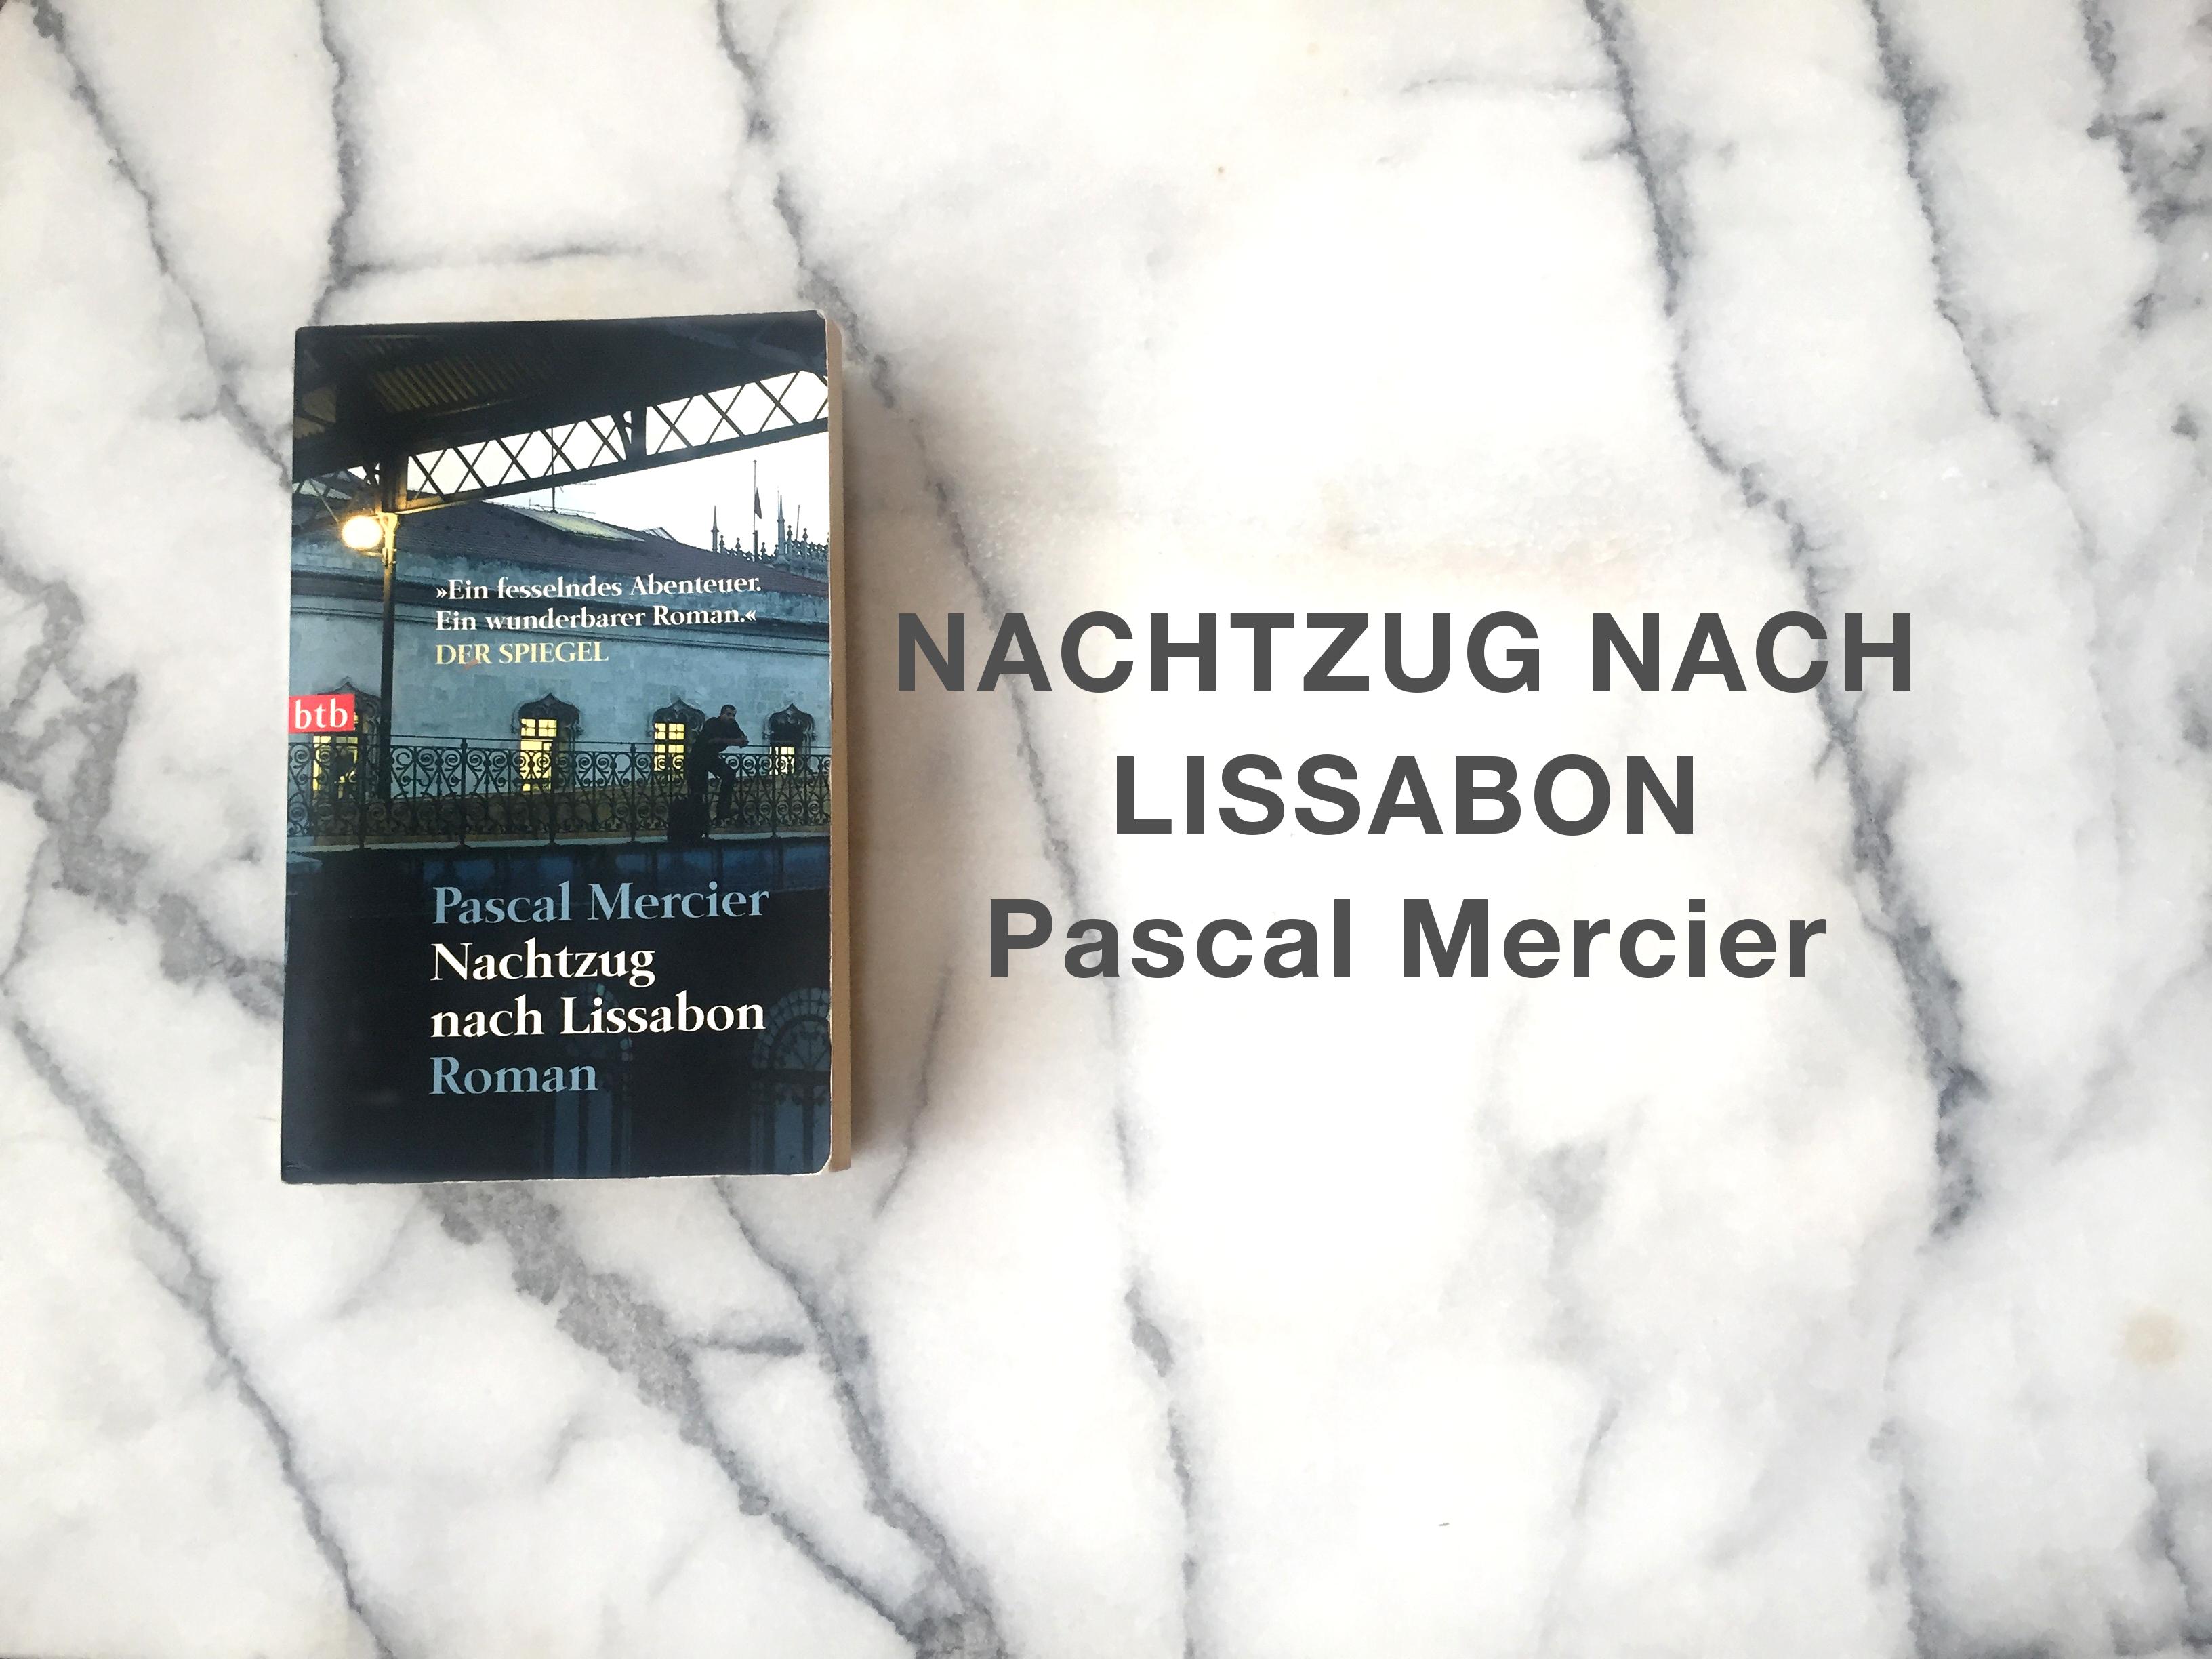 Nachtzug nach Lissabon Pascal Mercier